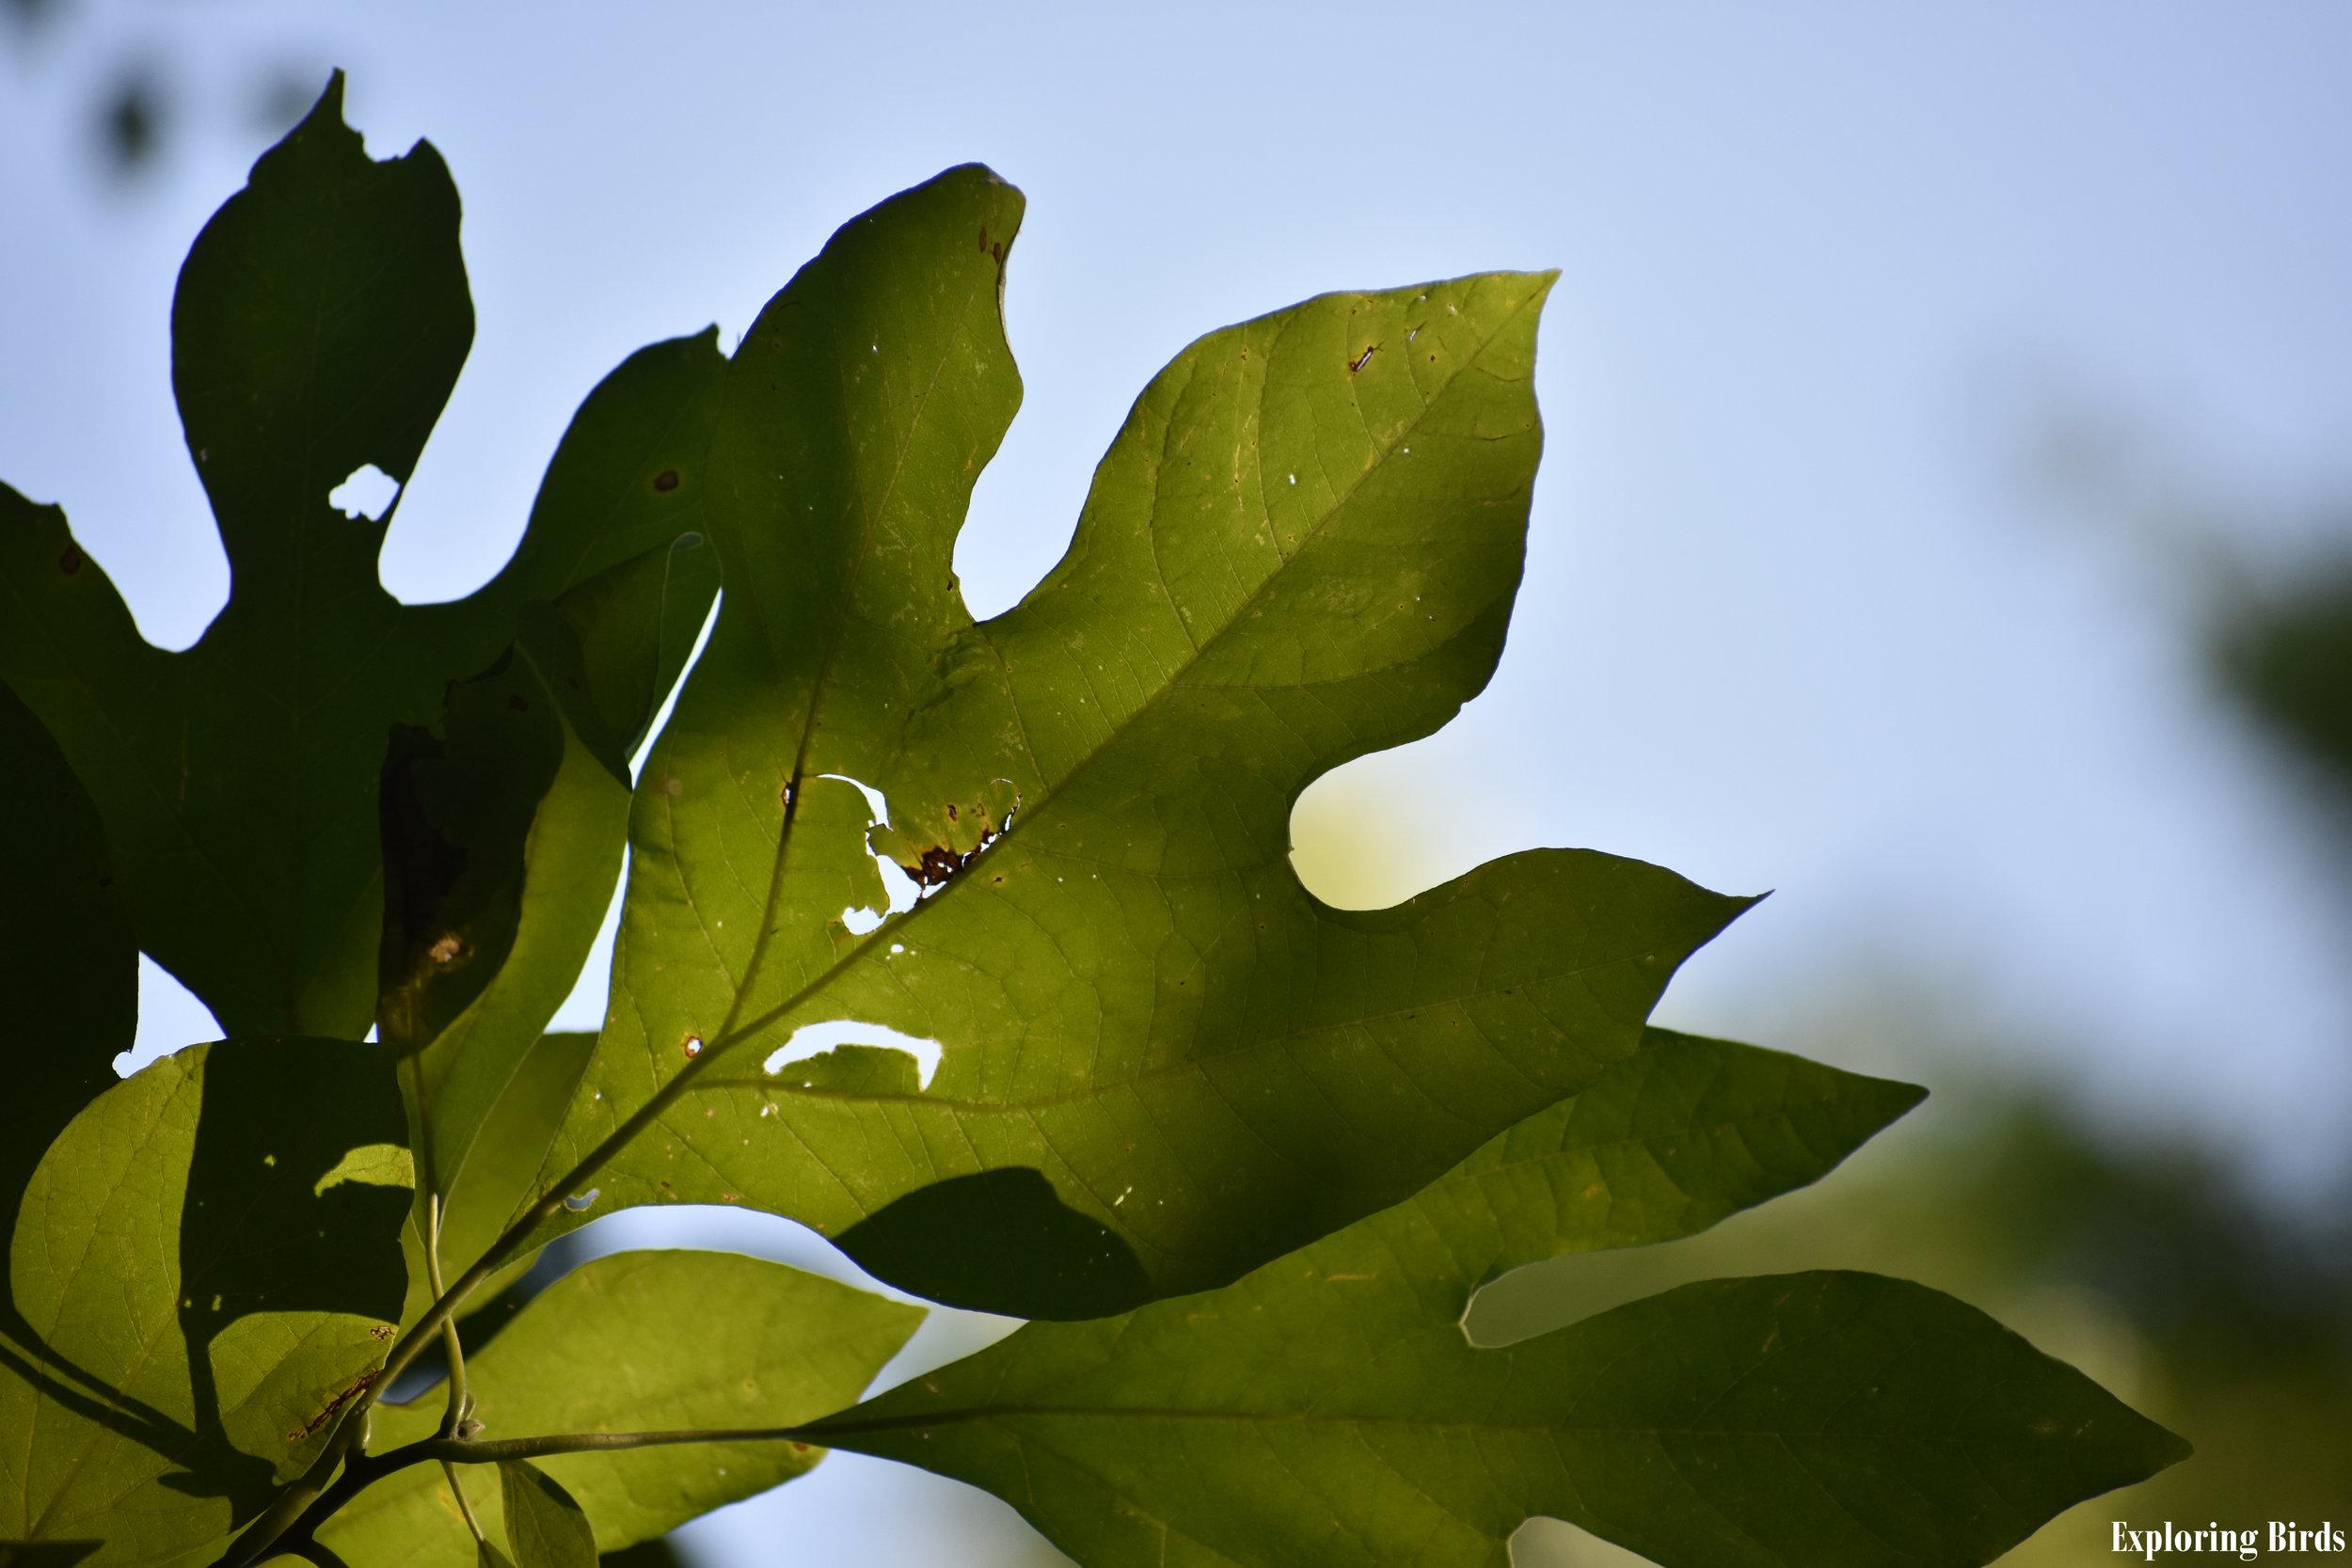 Sassafras is a tree that attracts birds